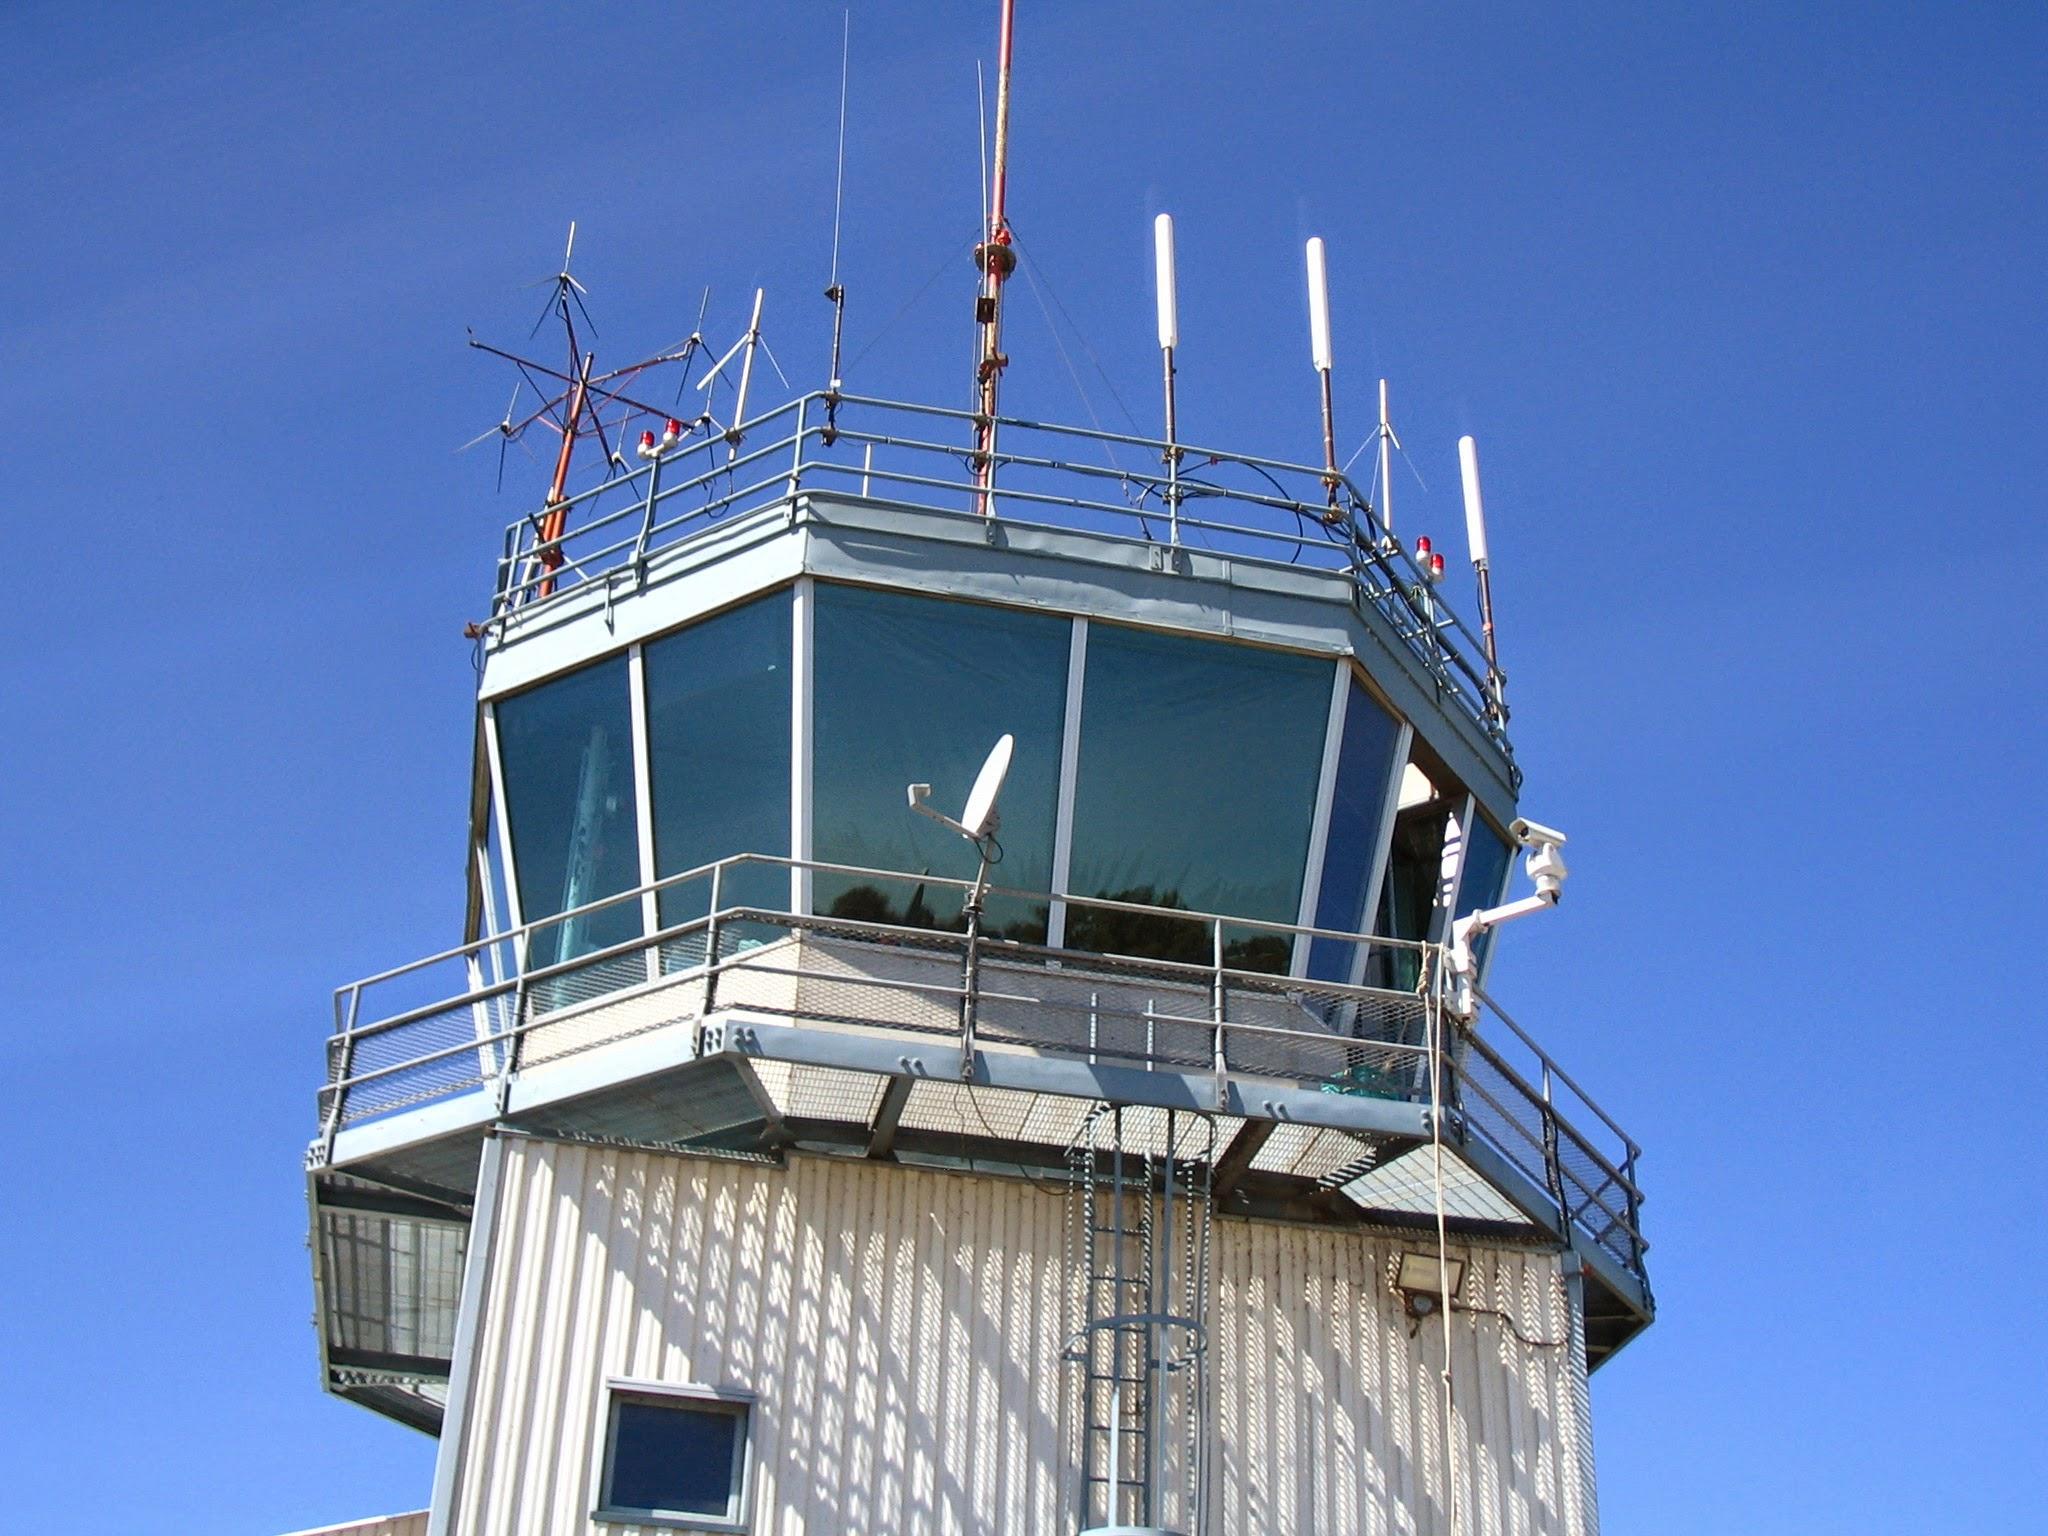 Picasa - trenton air traffic control 001.jpg